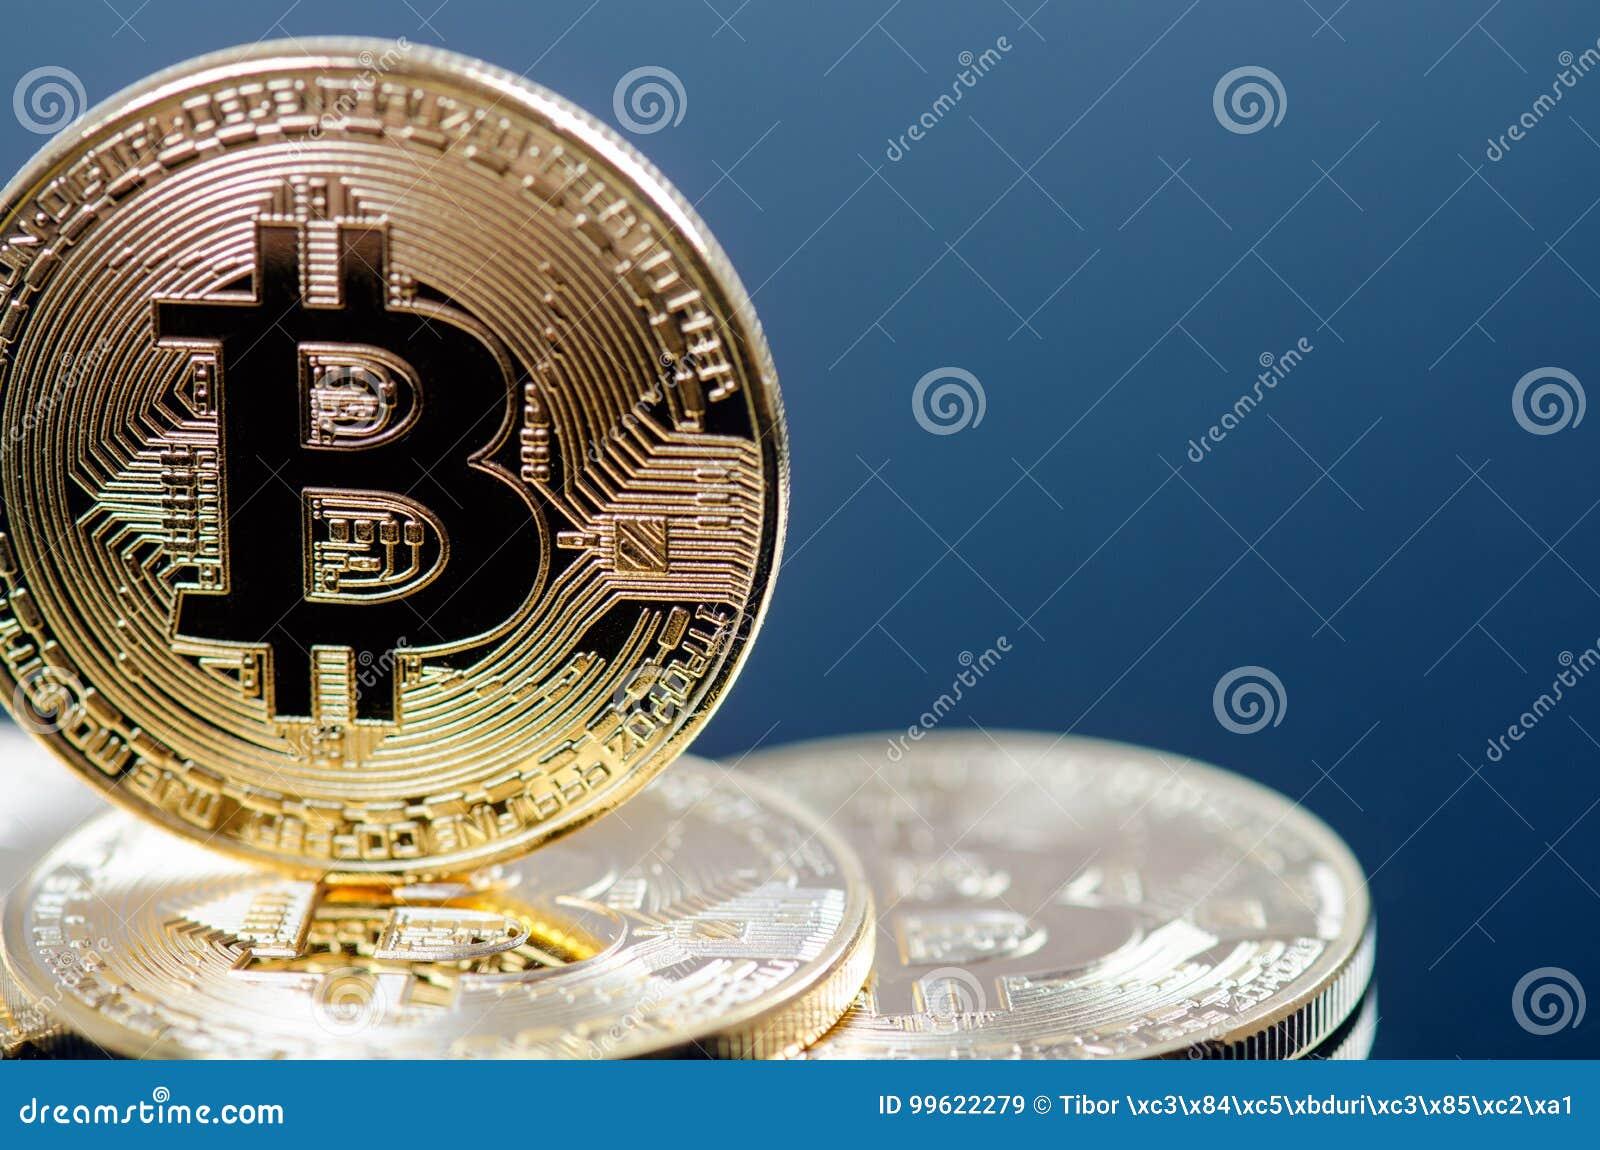 bitcoin 40x price